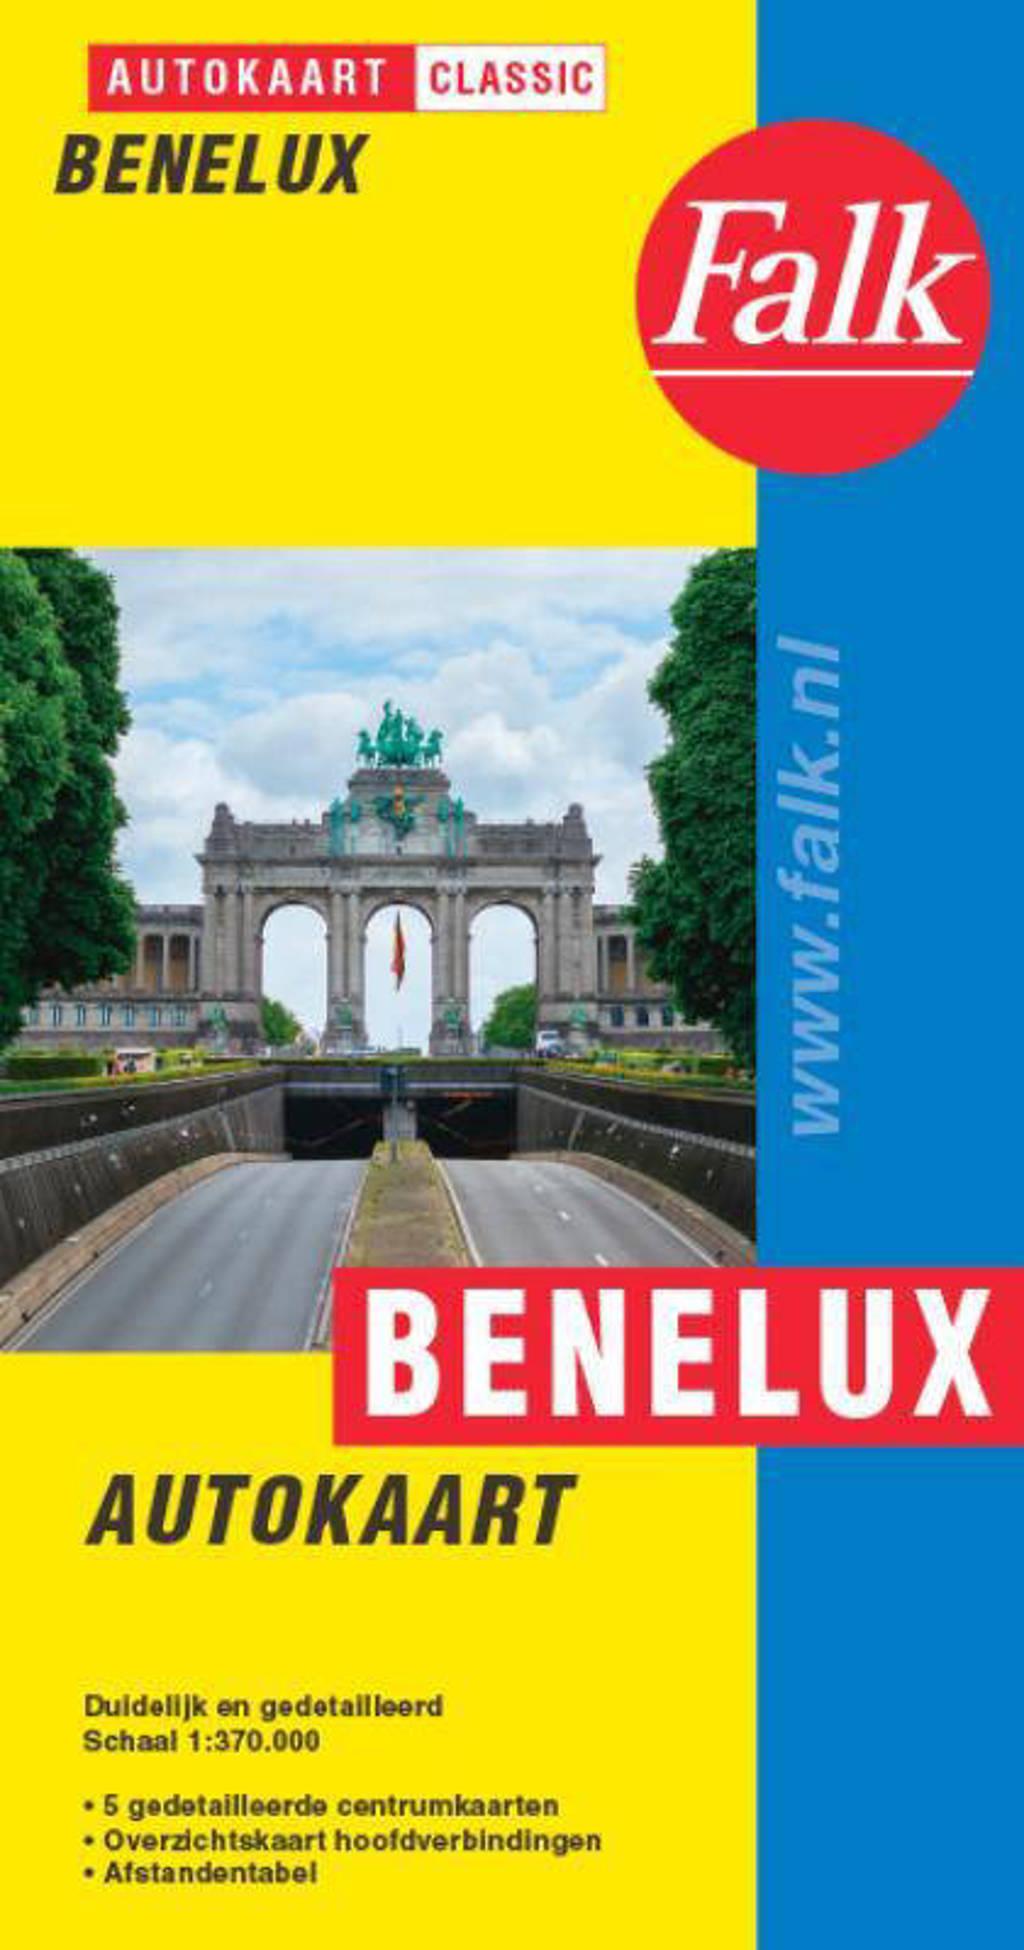 Falk autokaart Benelux classic